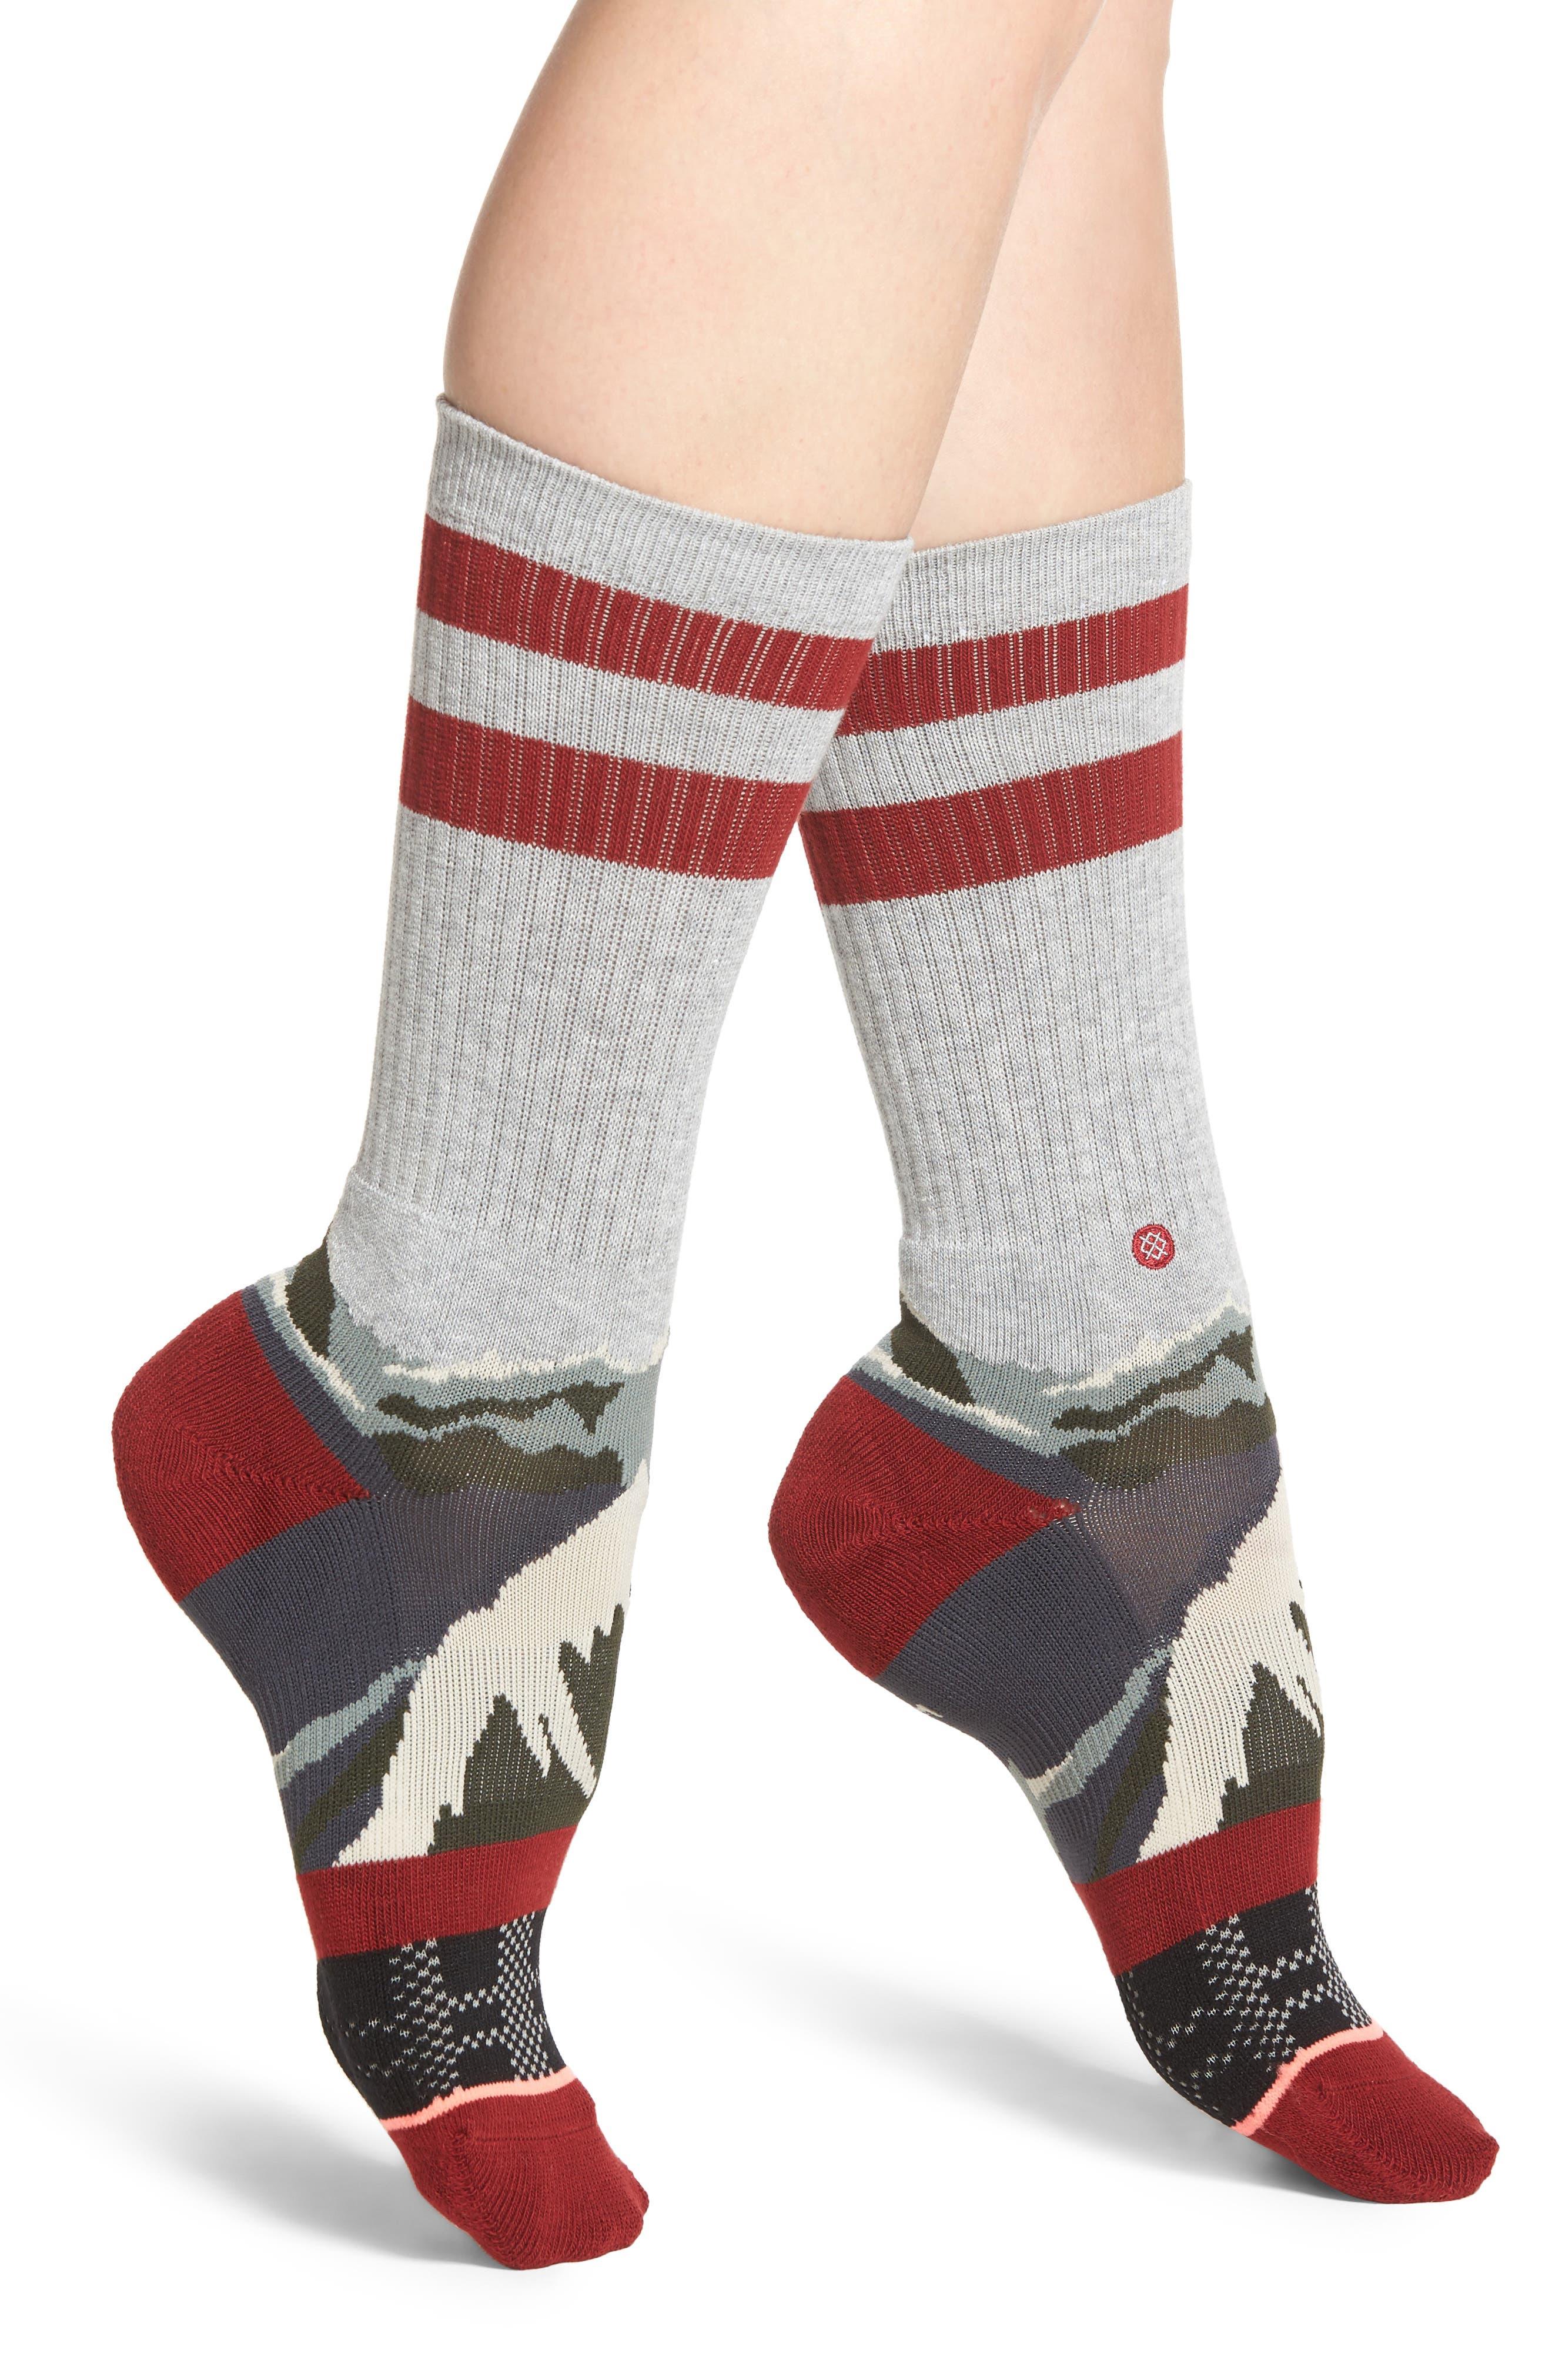 Happy Camper Crew Socks,                             Main thumbnail 1, color,                             020